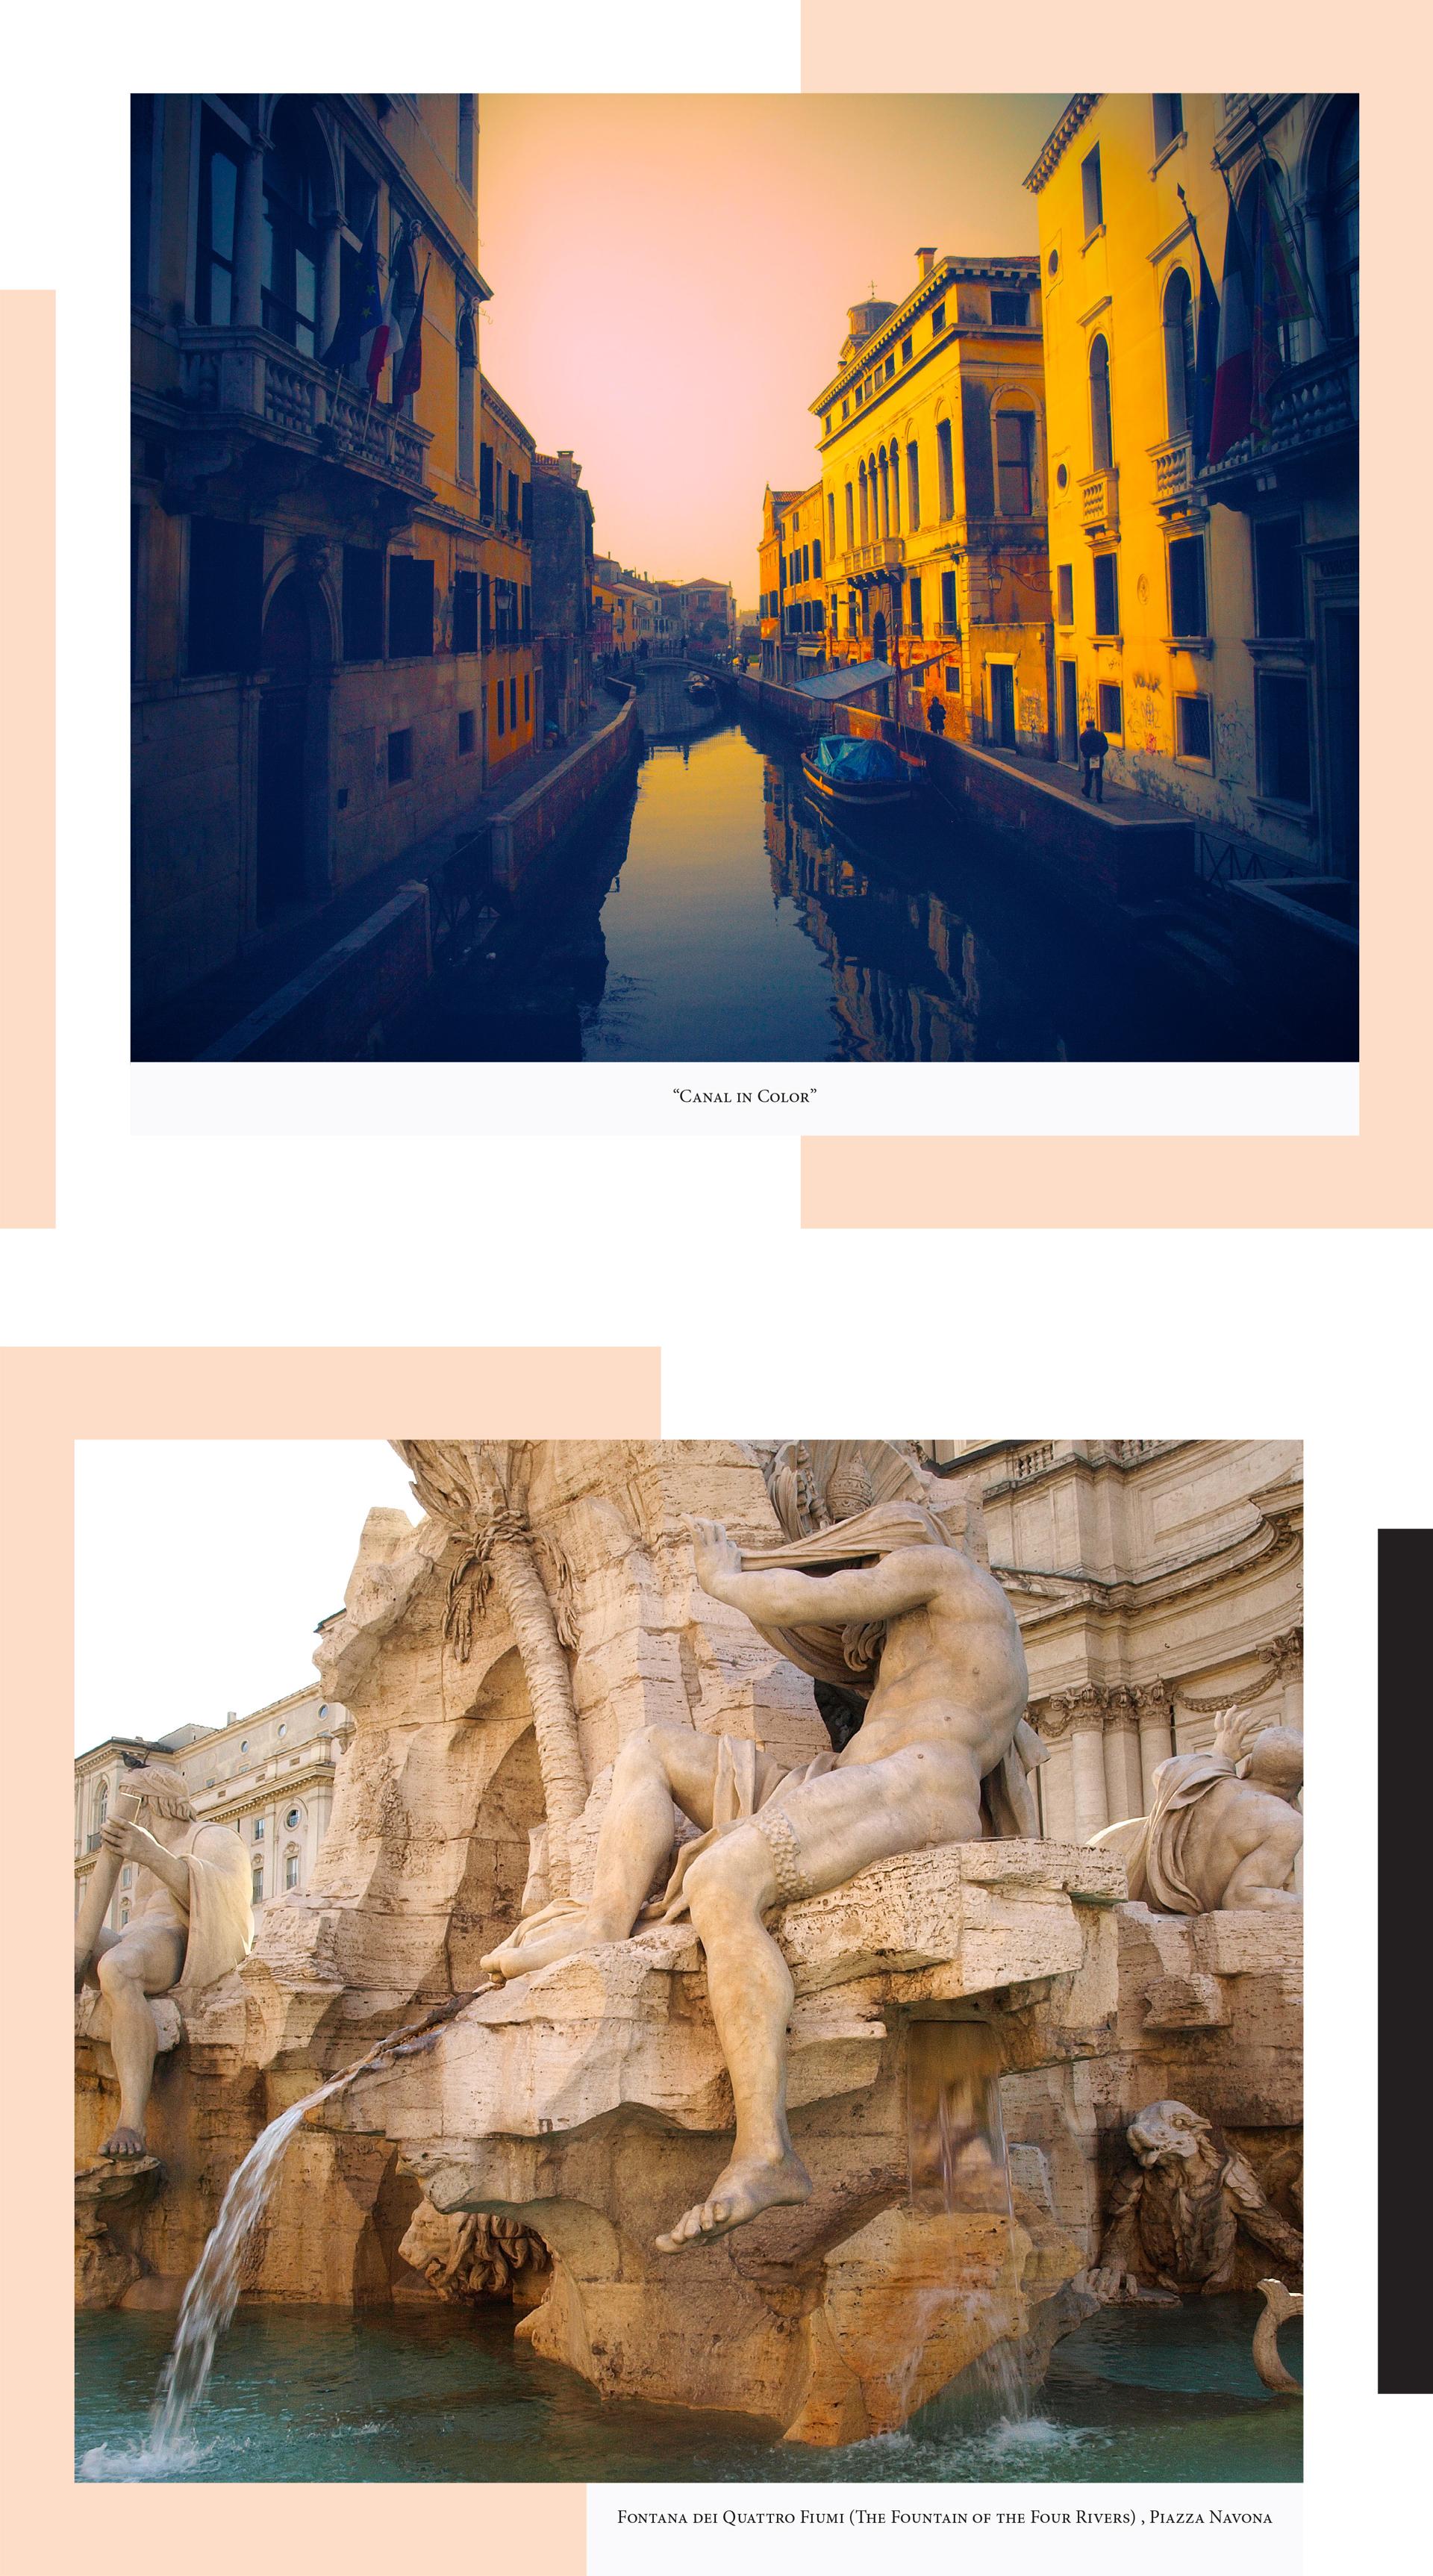 GeenaMatuson_TheGirlMirage_Trip-to-Italy_Book_03.jpg